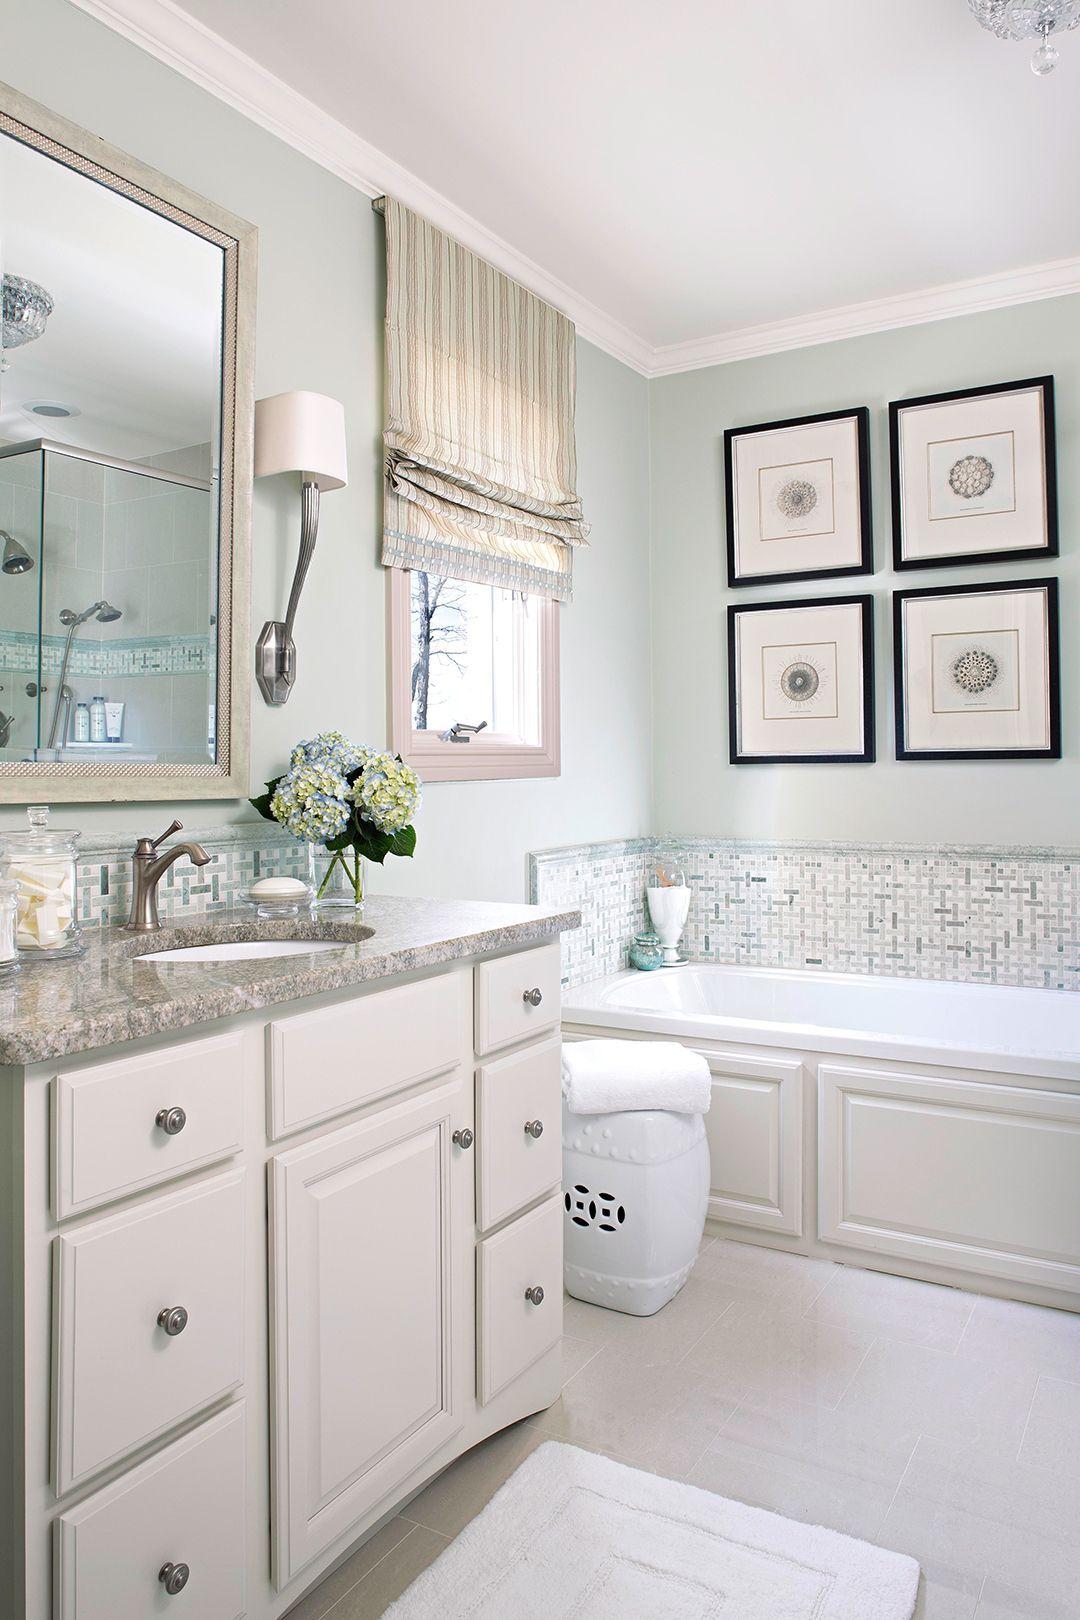 Best Paint Colors For Bathrooms In 2020 Best Bathroom Colors Popular Bathroom Colors Best Bathroom Paint Colors